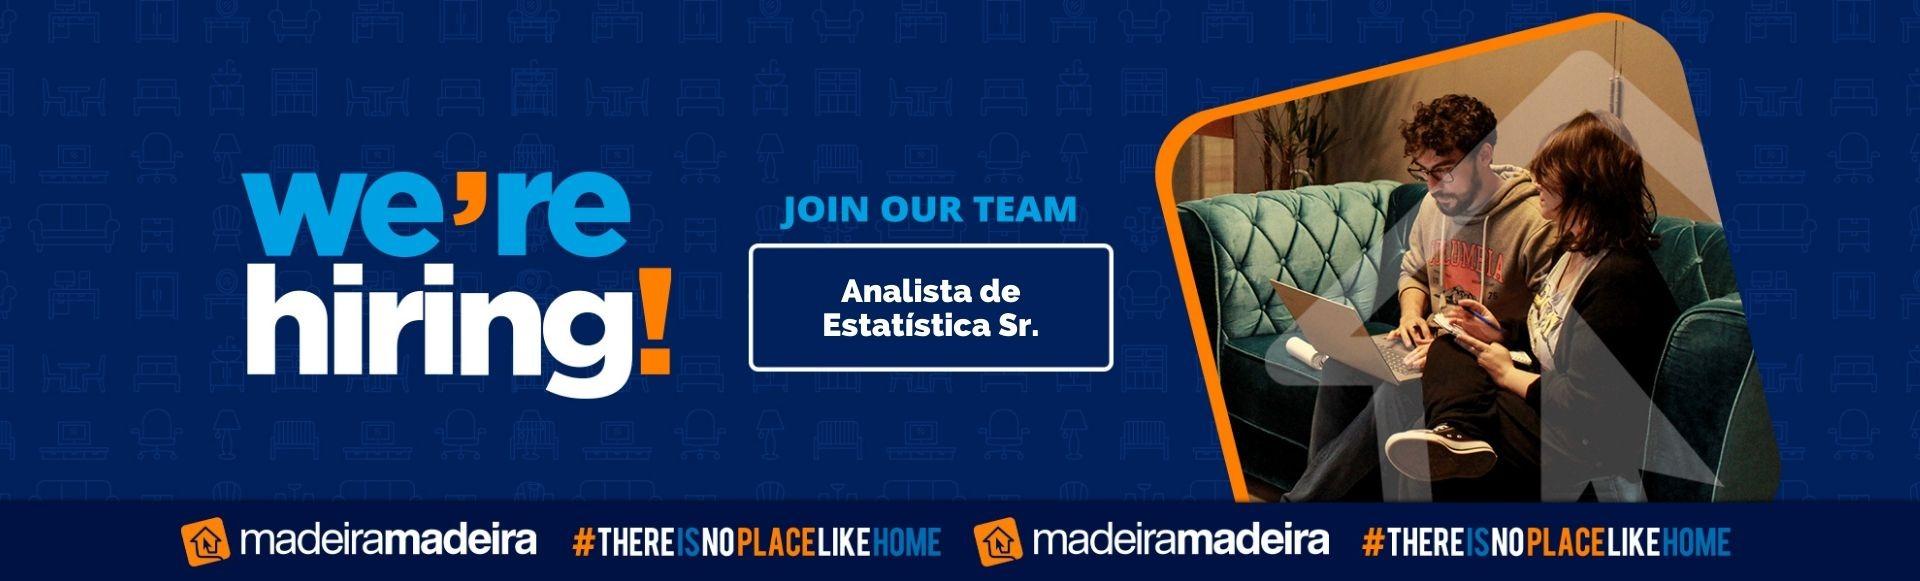 Analista de Estatística Sr.